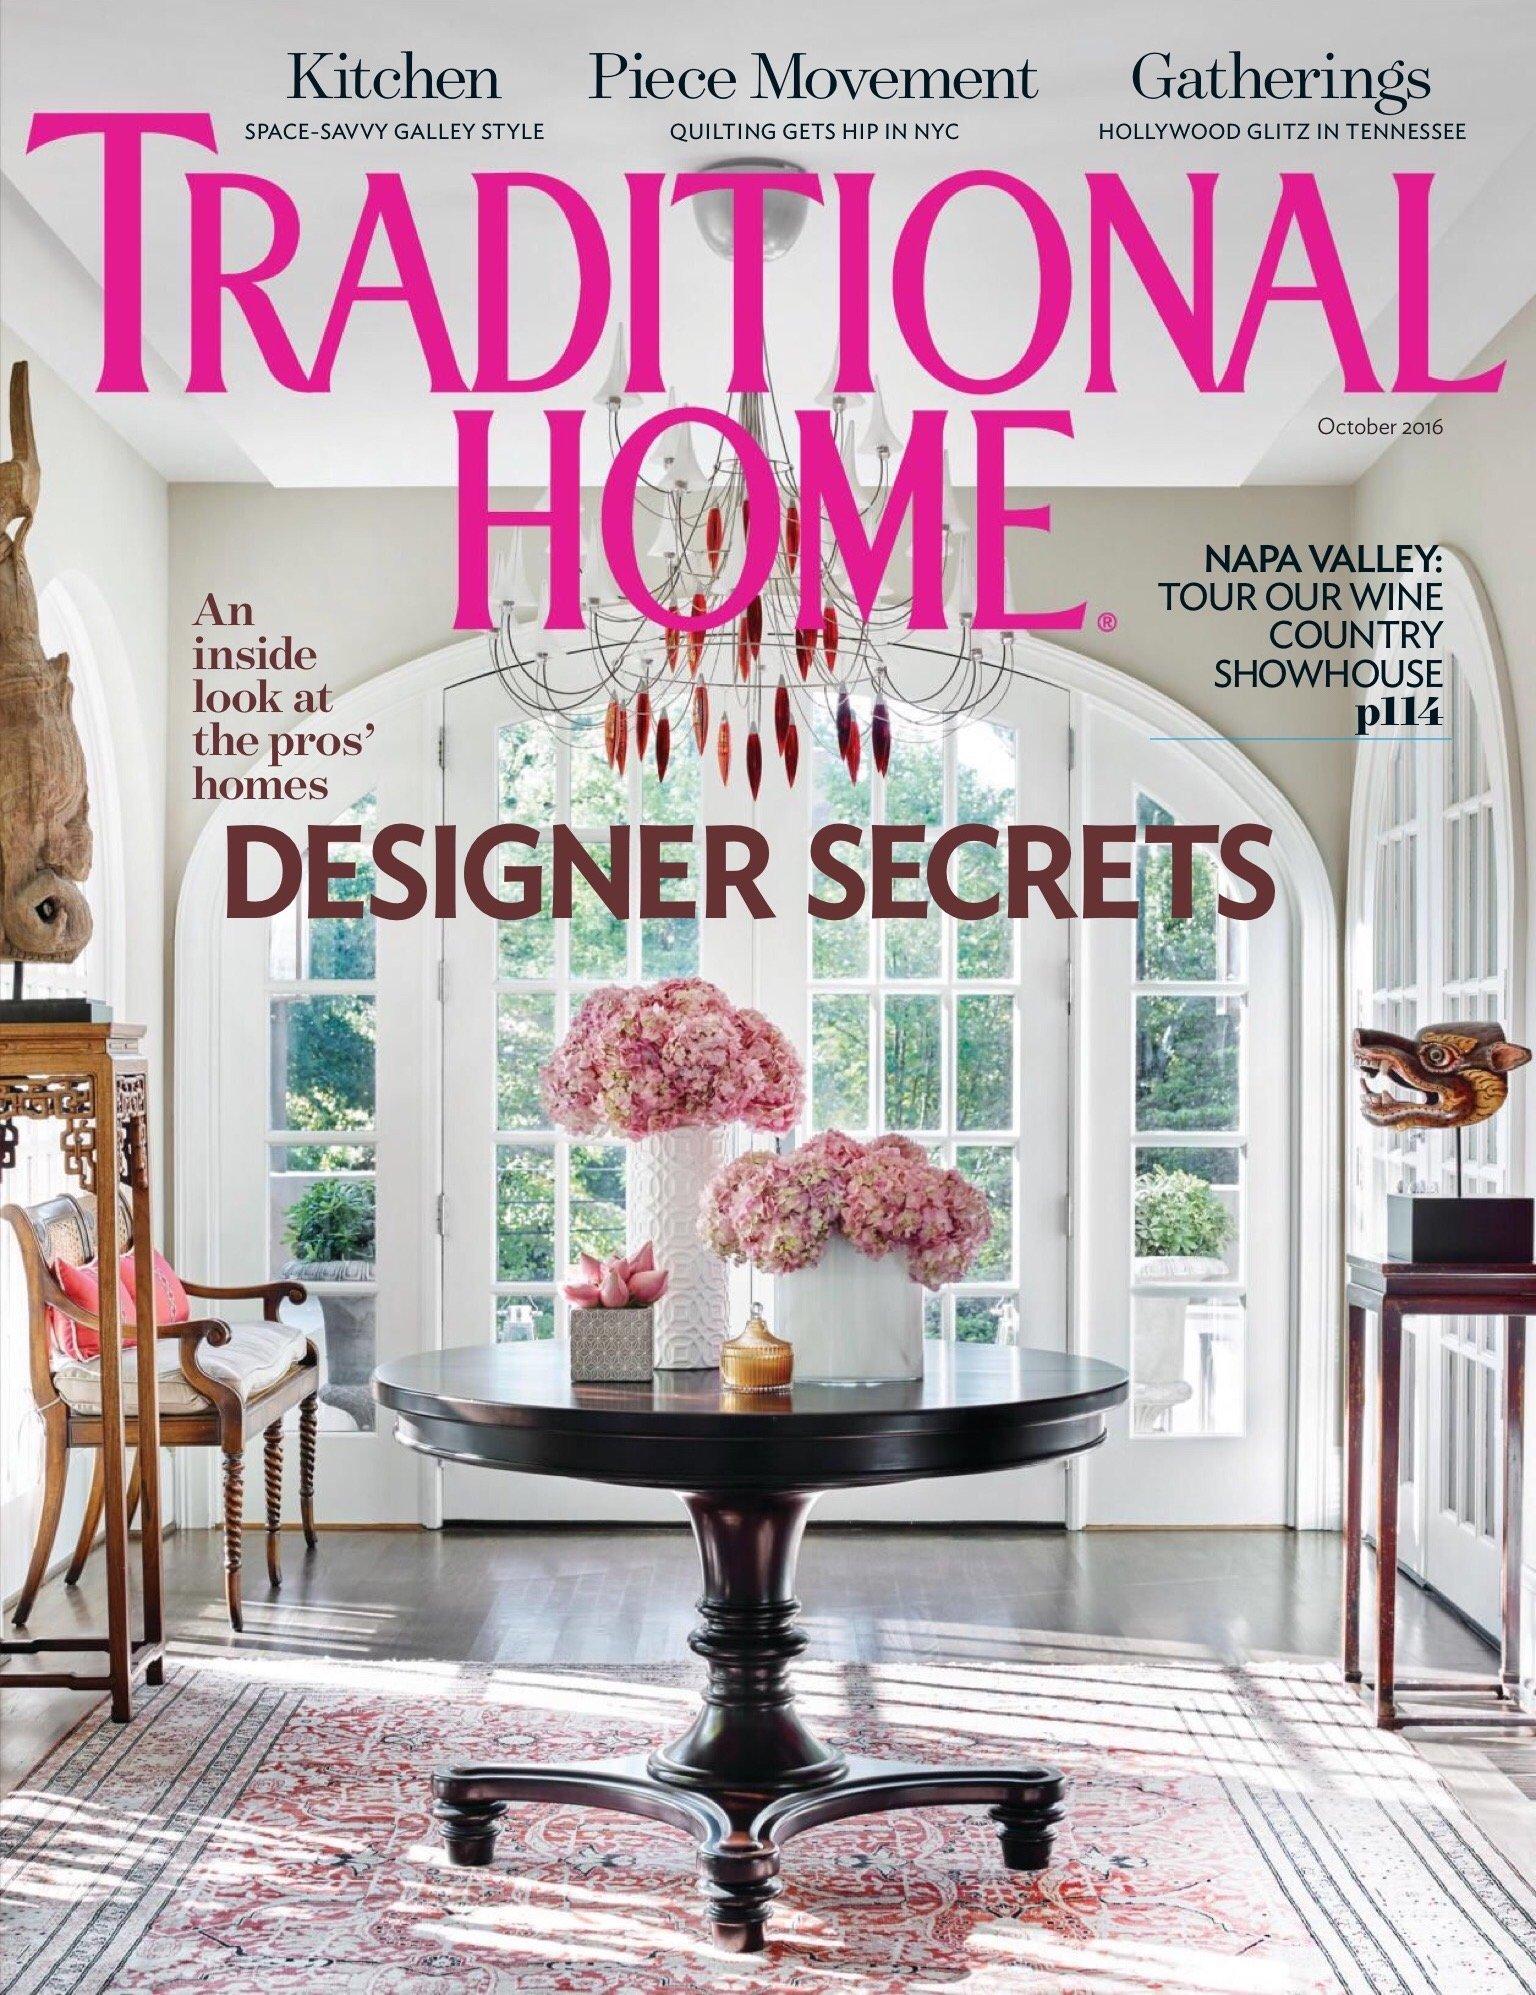 2016 Traditional Home magazine Napa Valley showcase